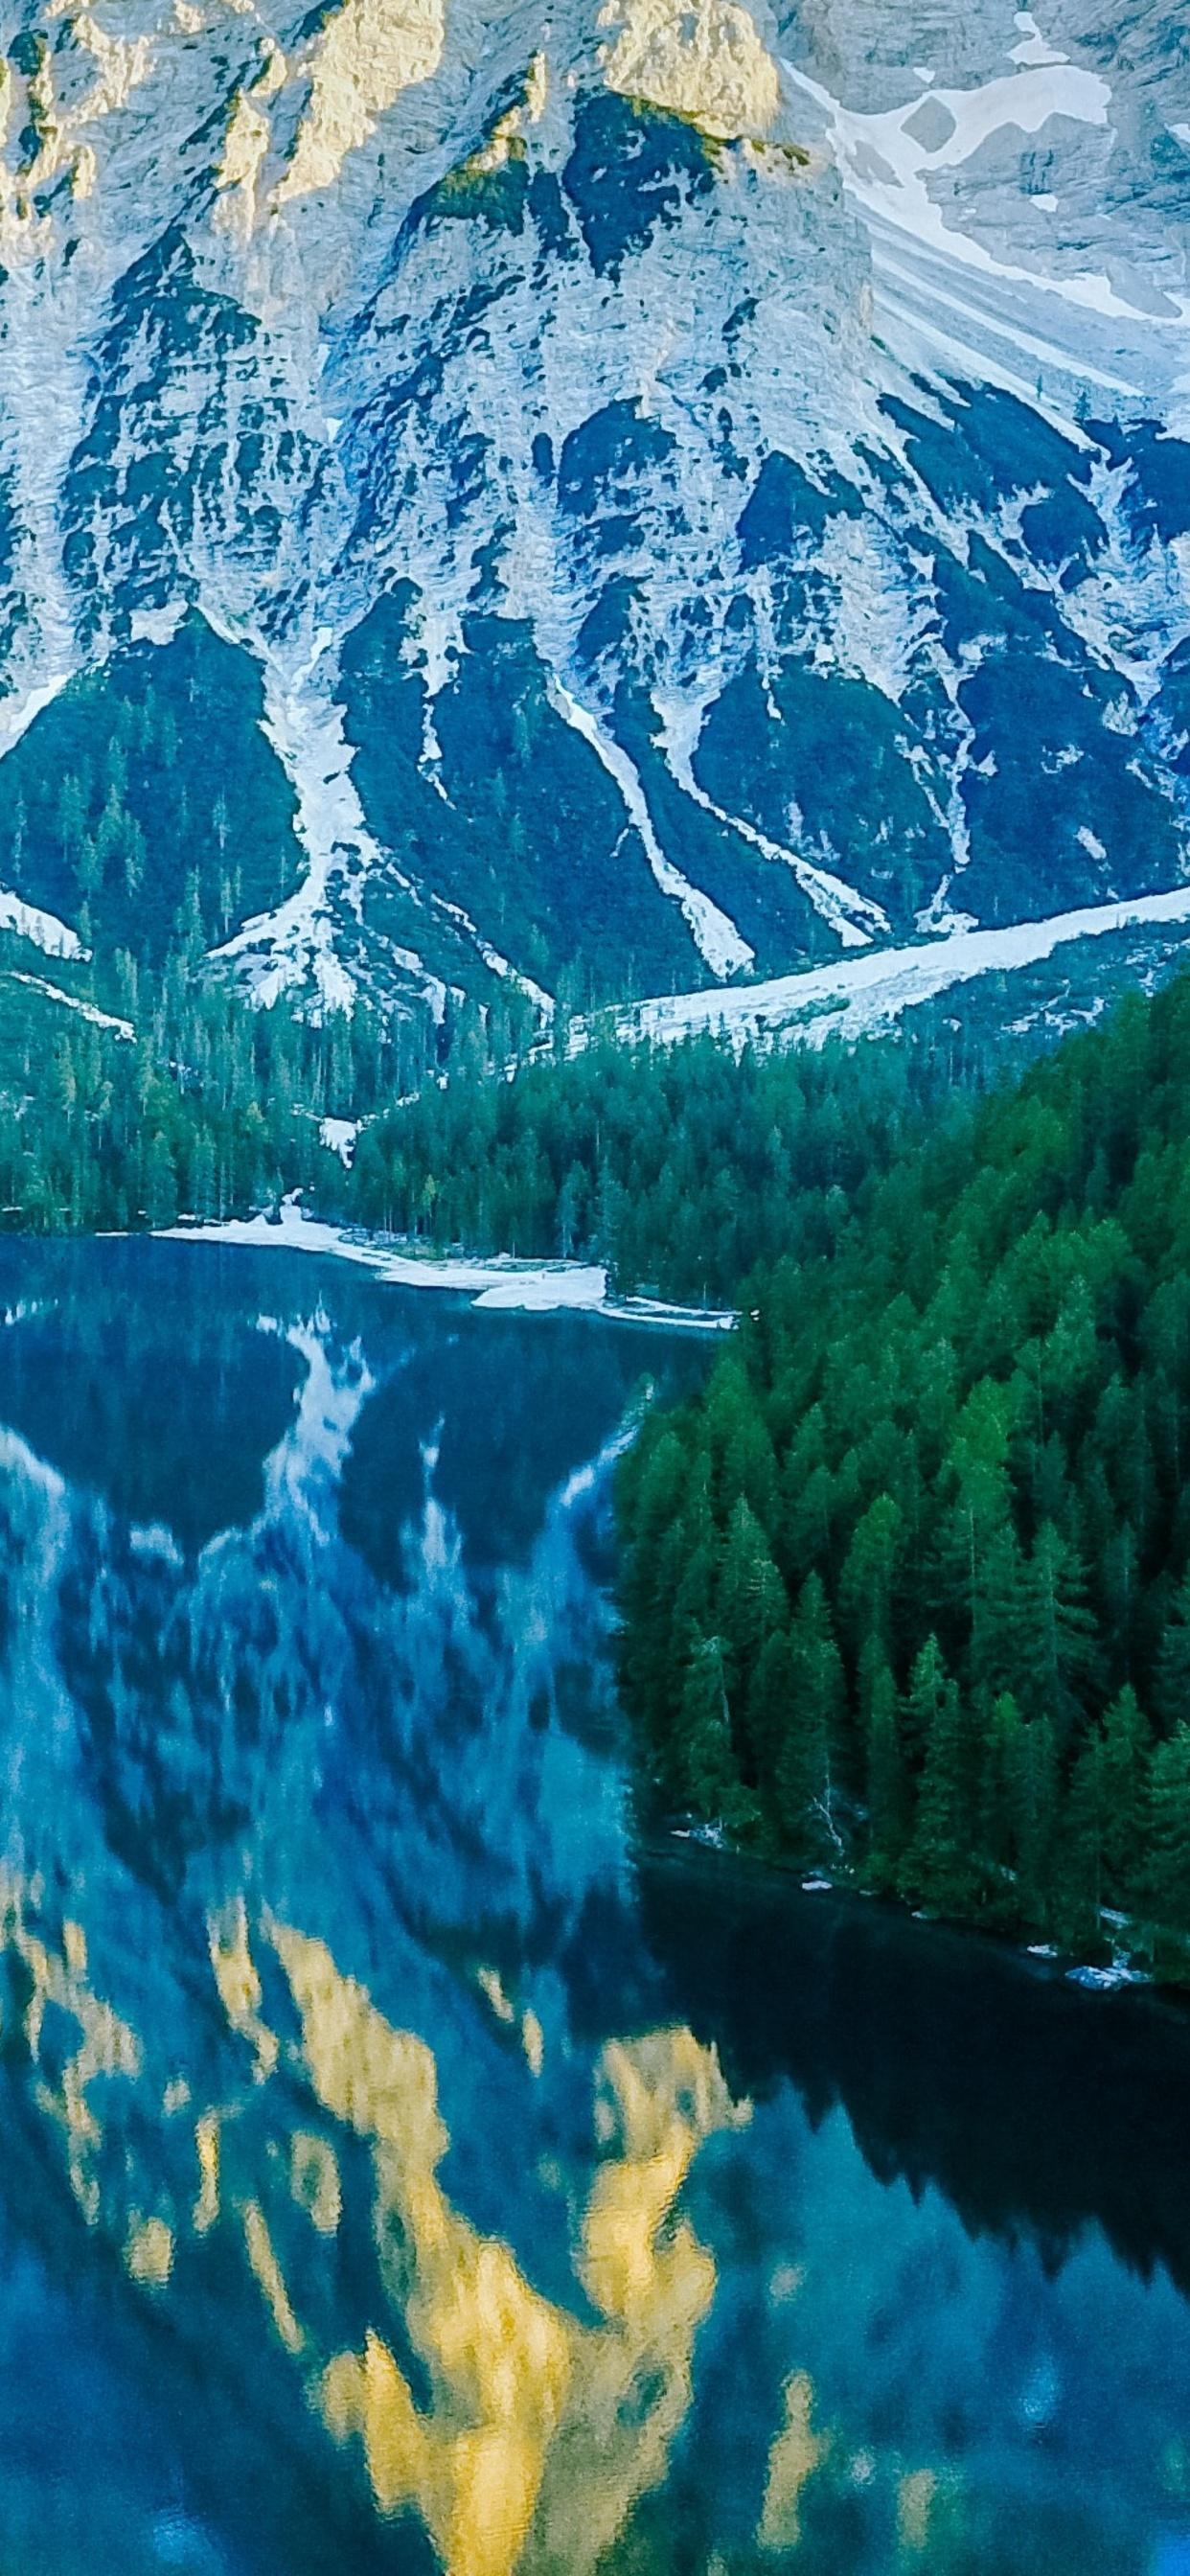 italian-mountains-lake-reflection-4k-jb.jpg